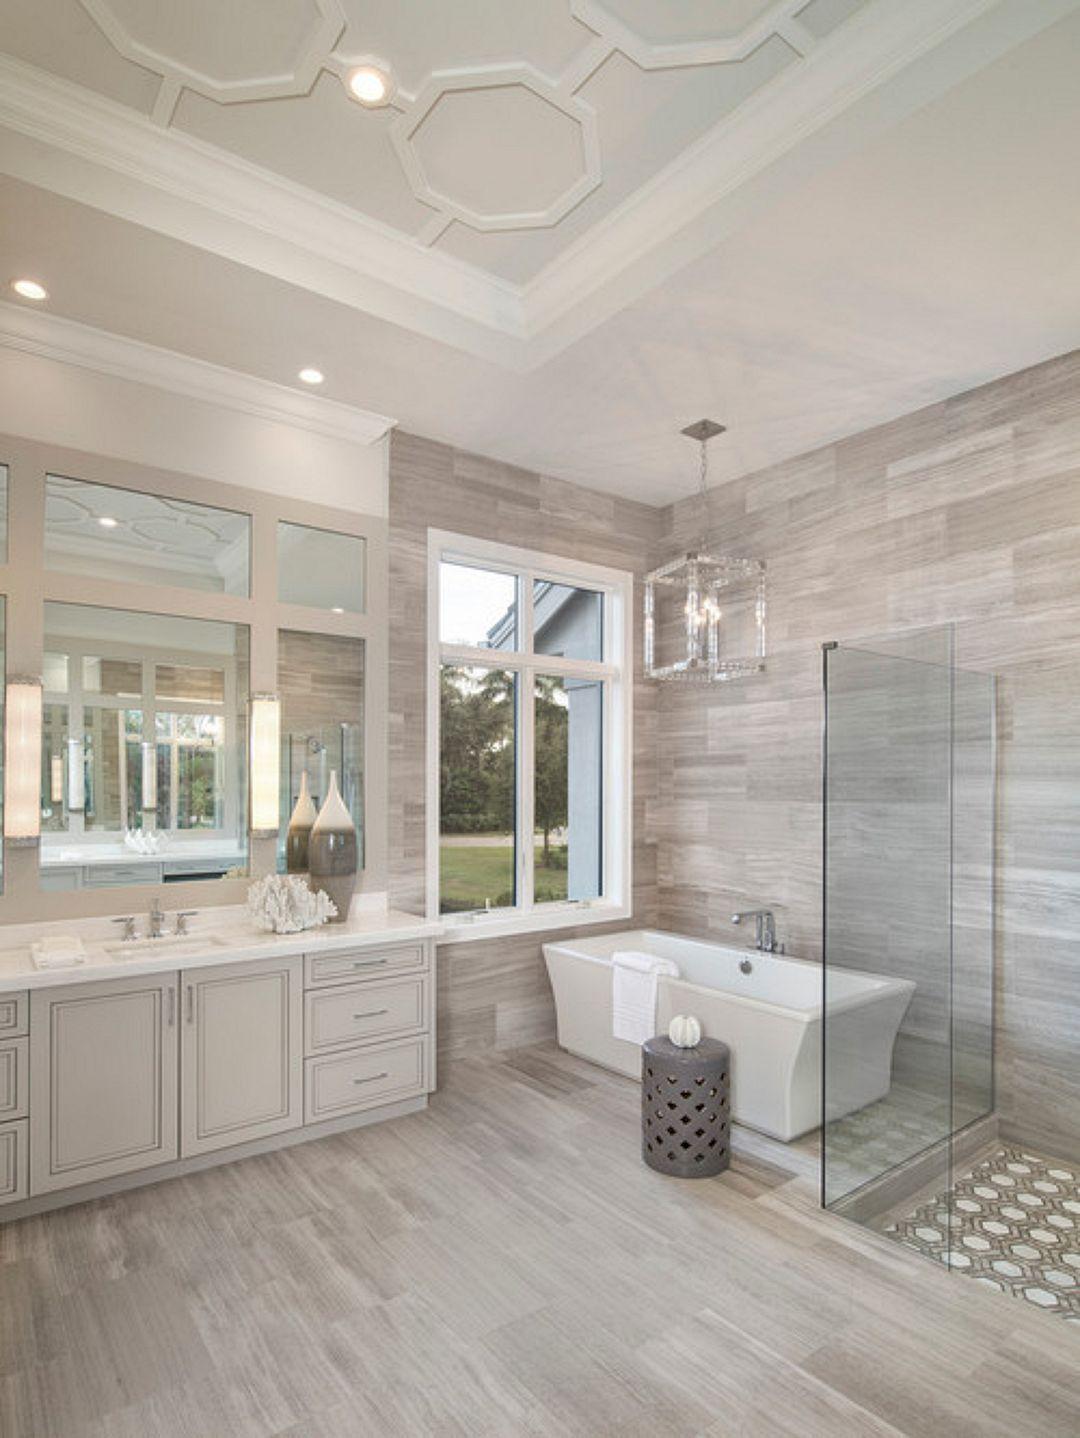 10+ Wonderful DIY Master Bathroom Ideas Remodel On a Budget images